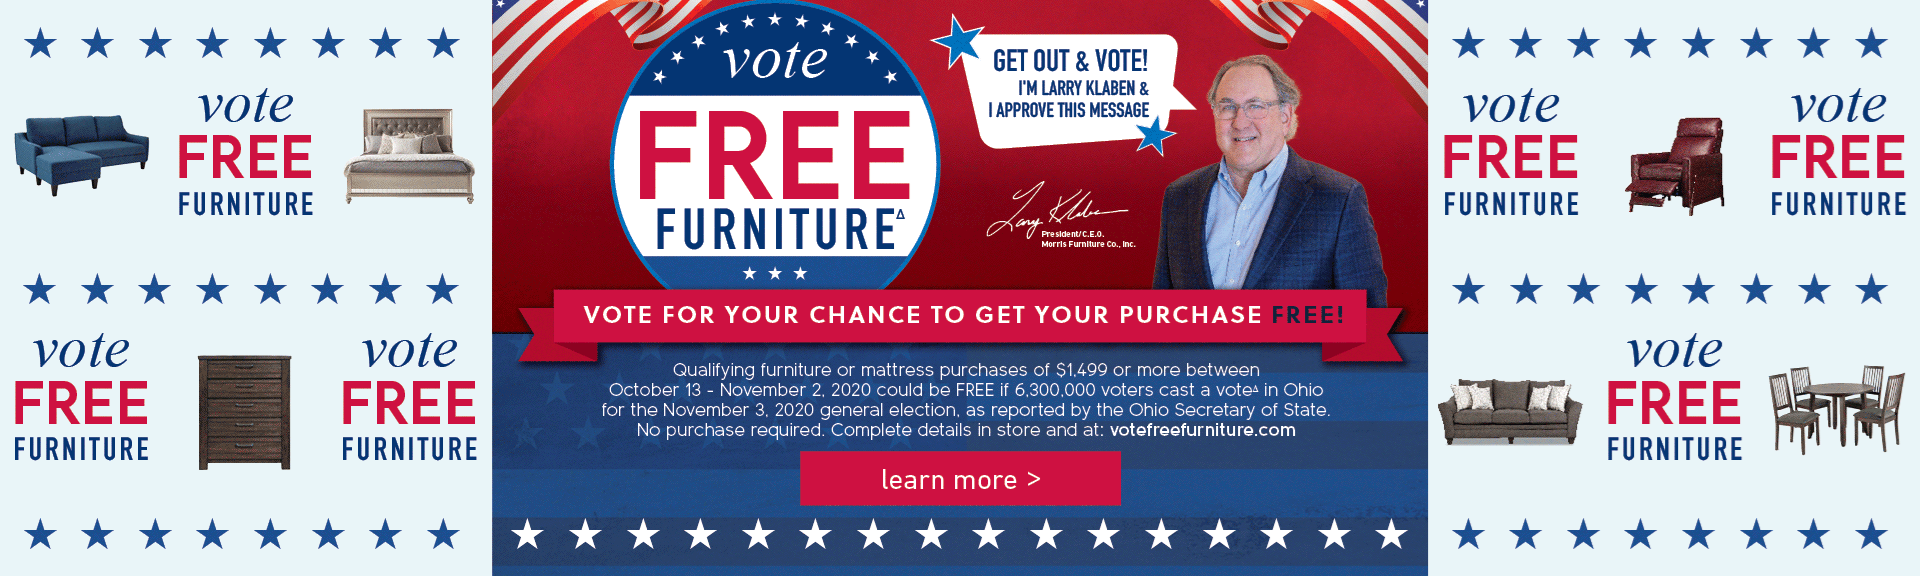 Vote Free Furniture